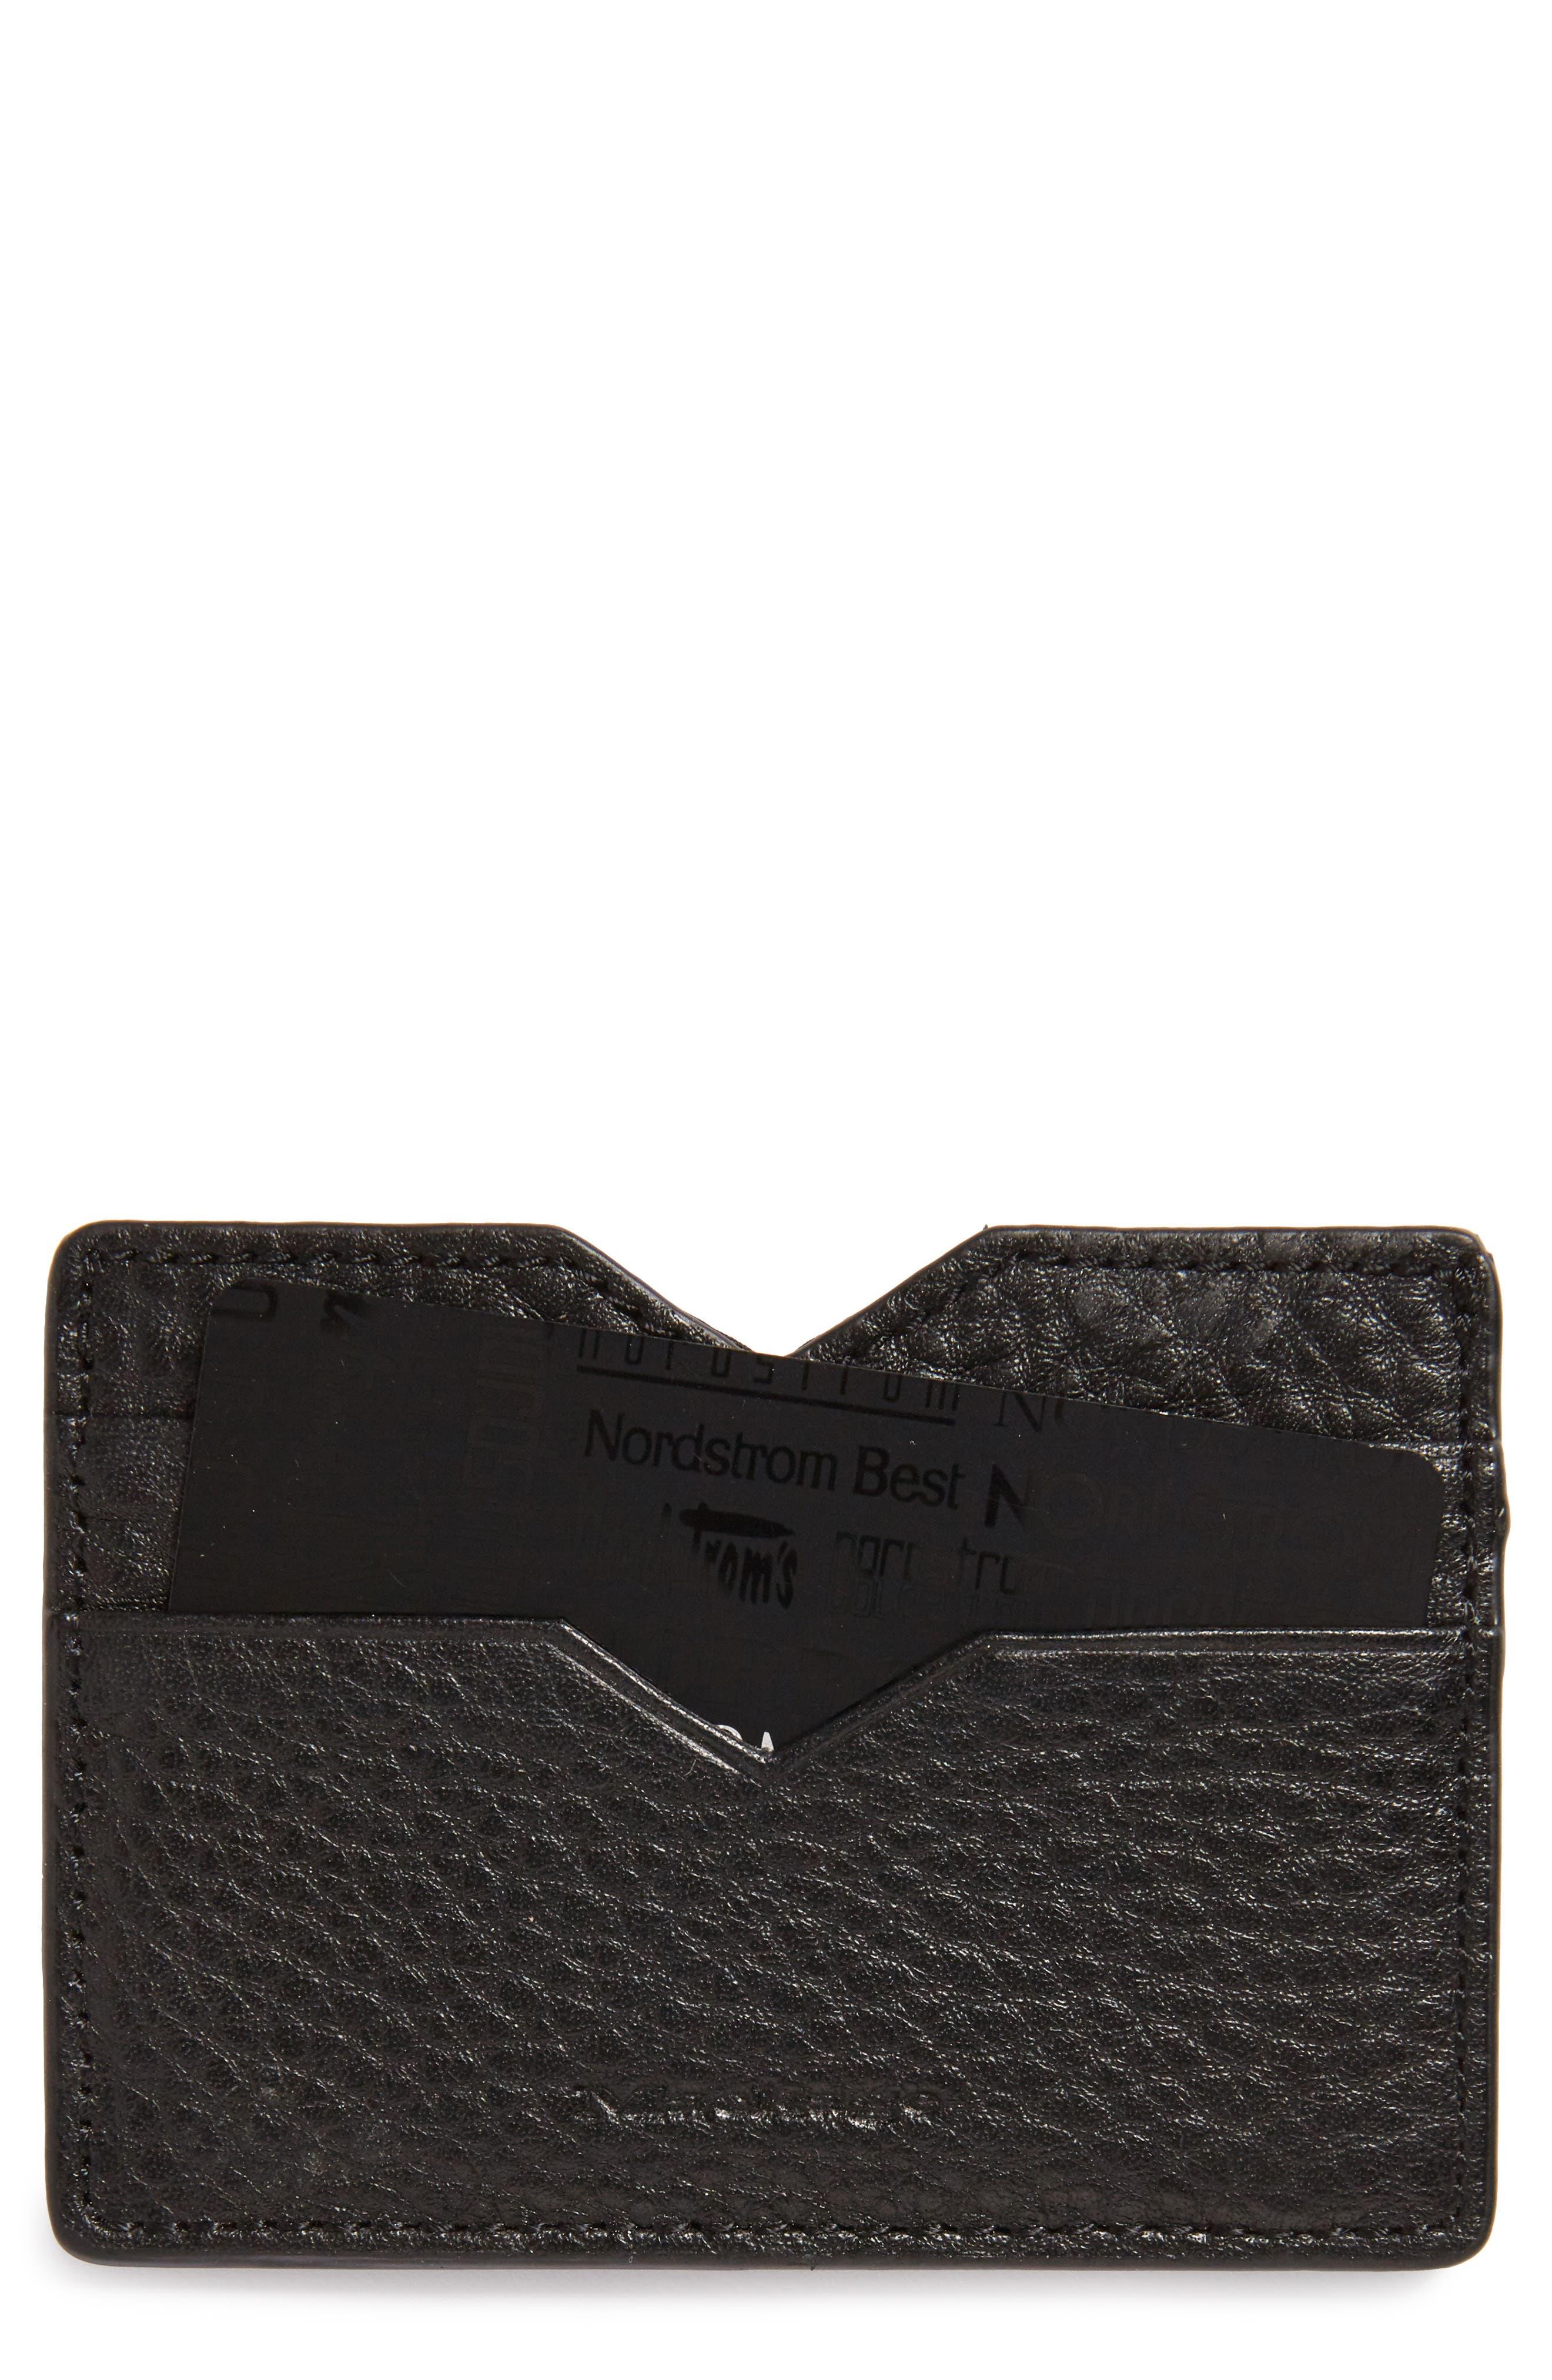 Wes Leather Card Case,                             Main thumbnail 1, color,                             Black